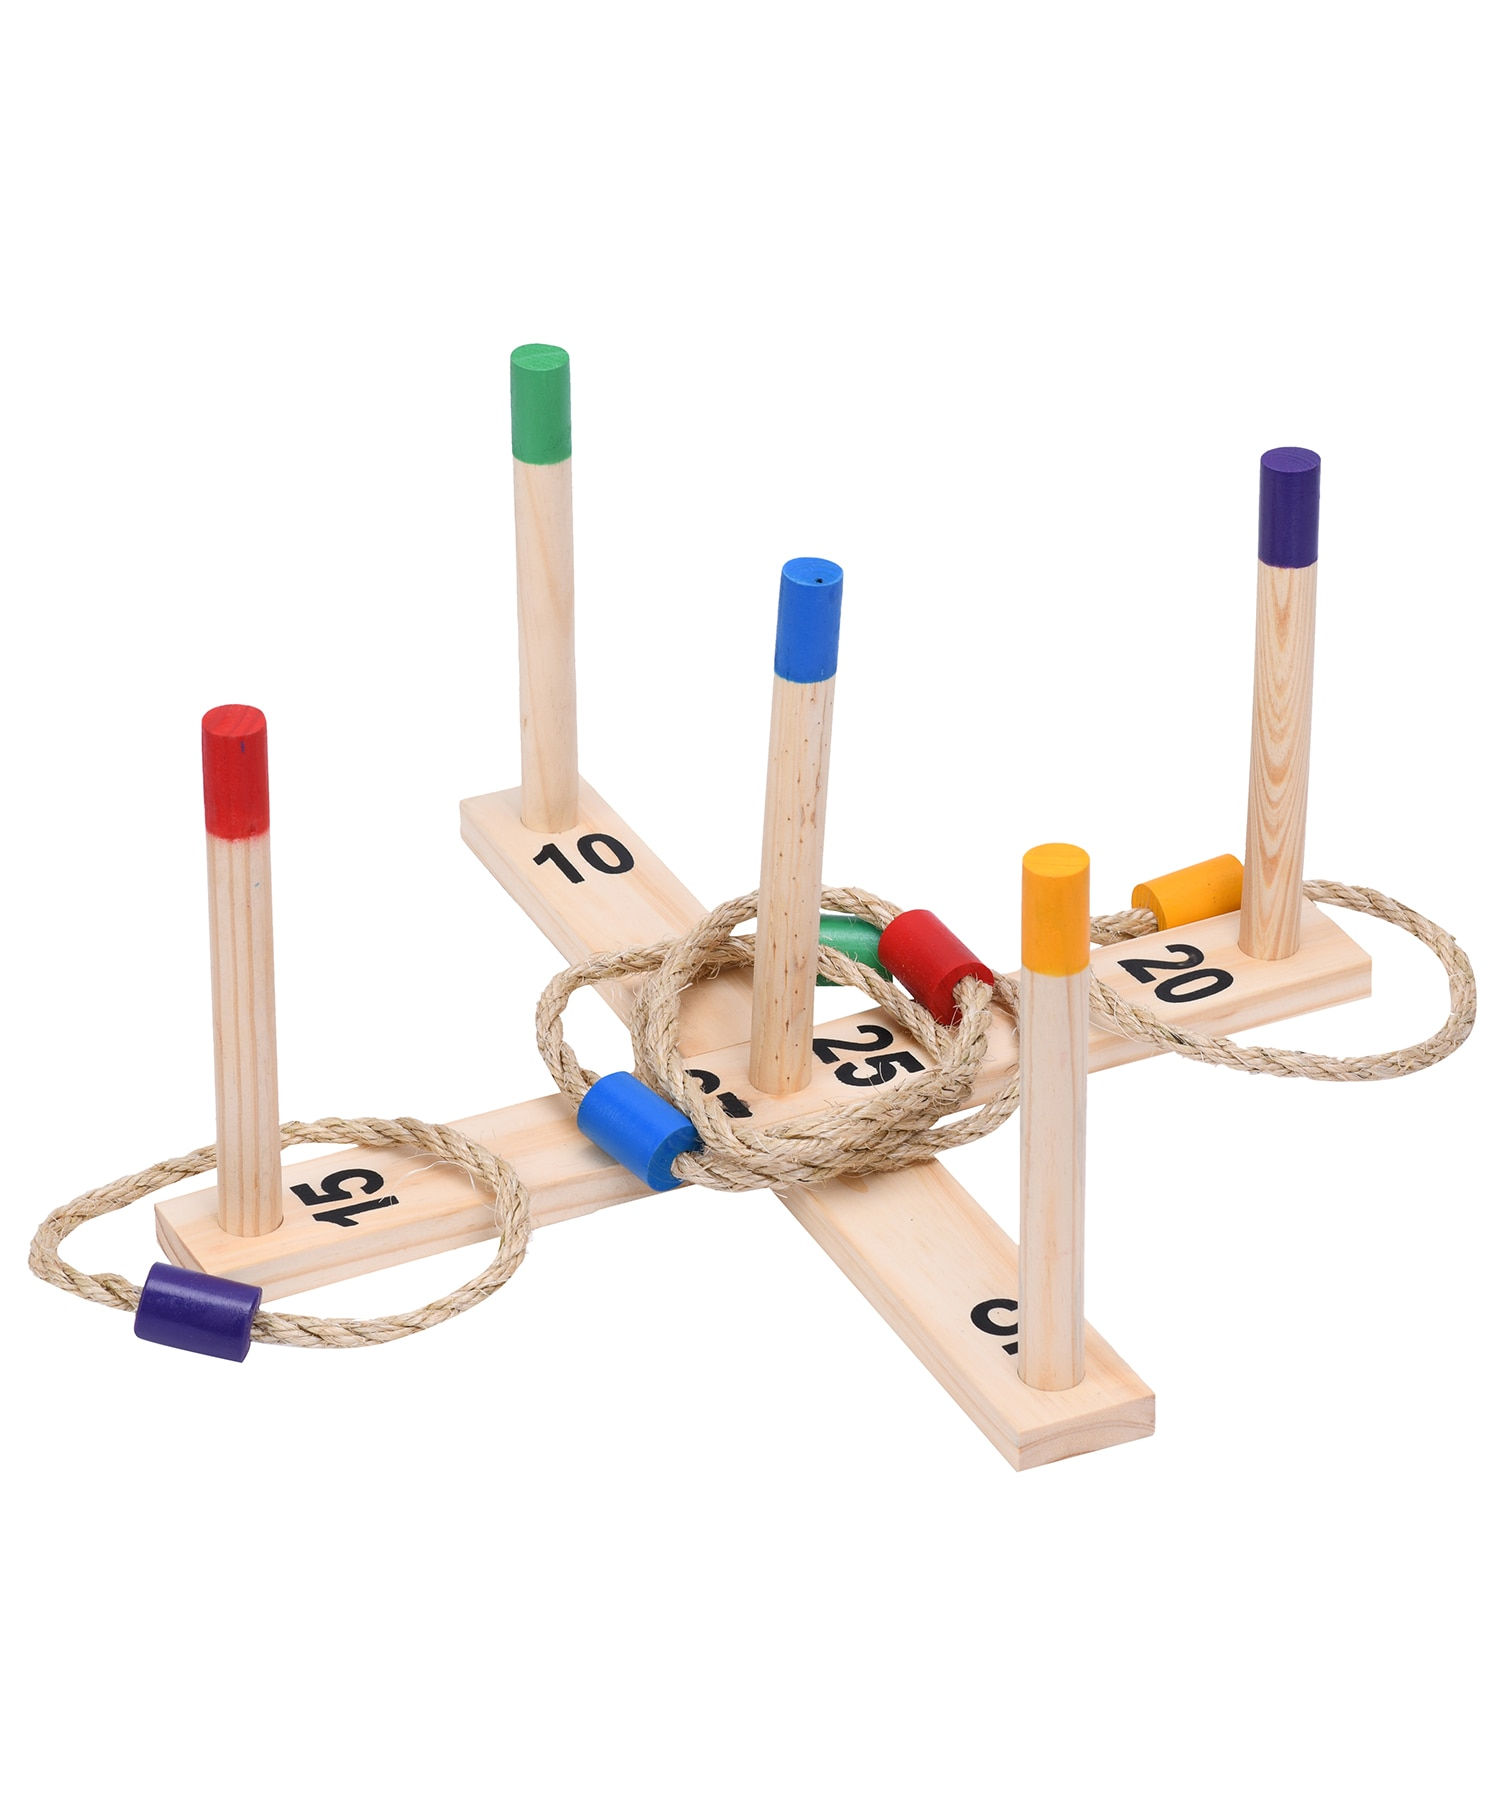 PlayX Ringspill i tre